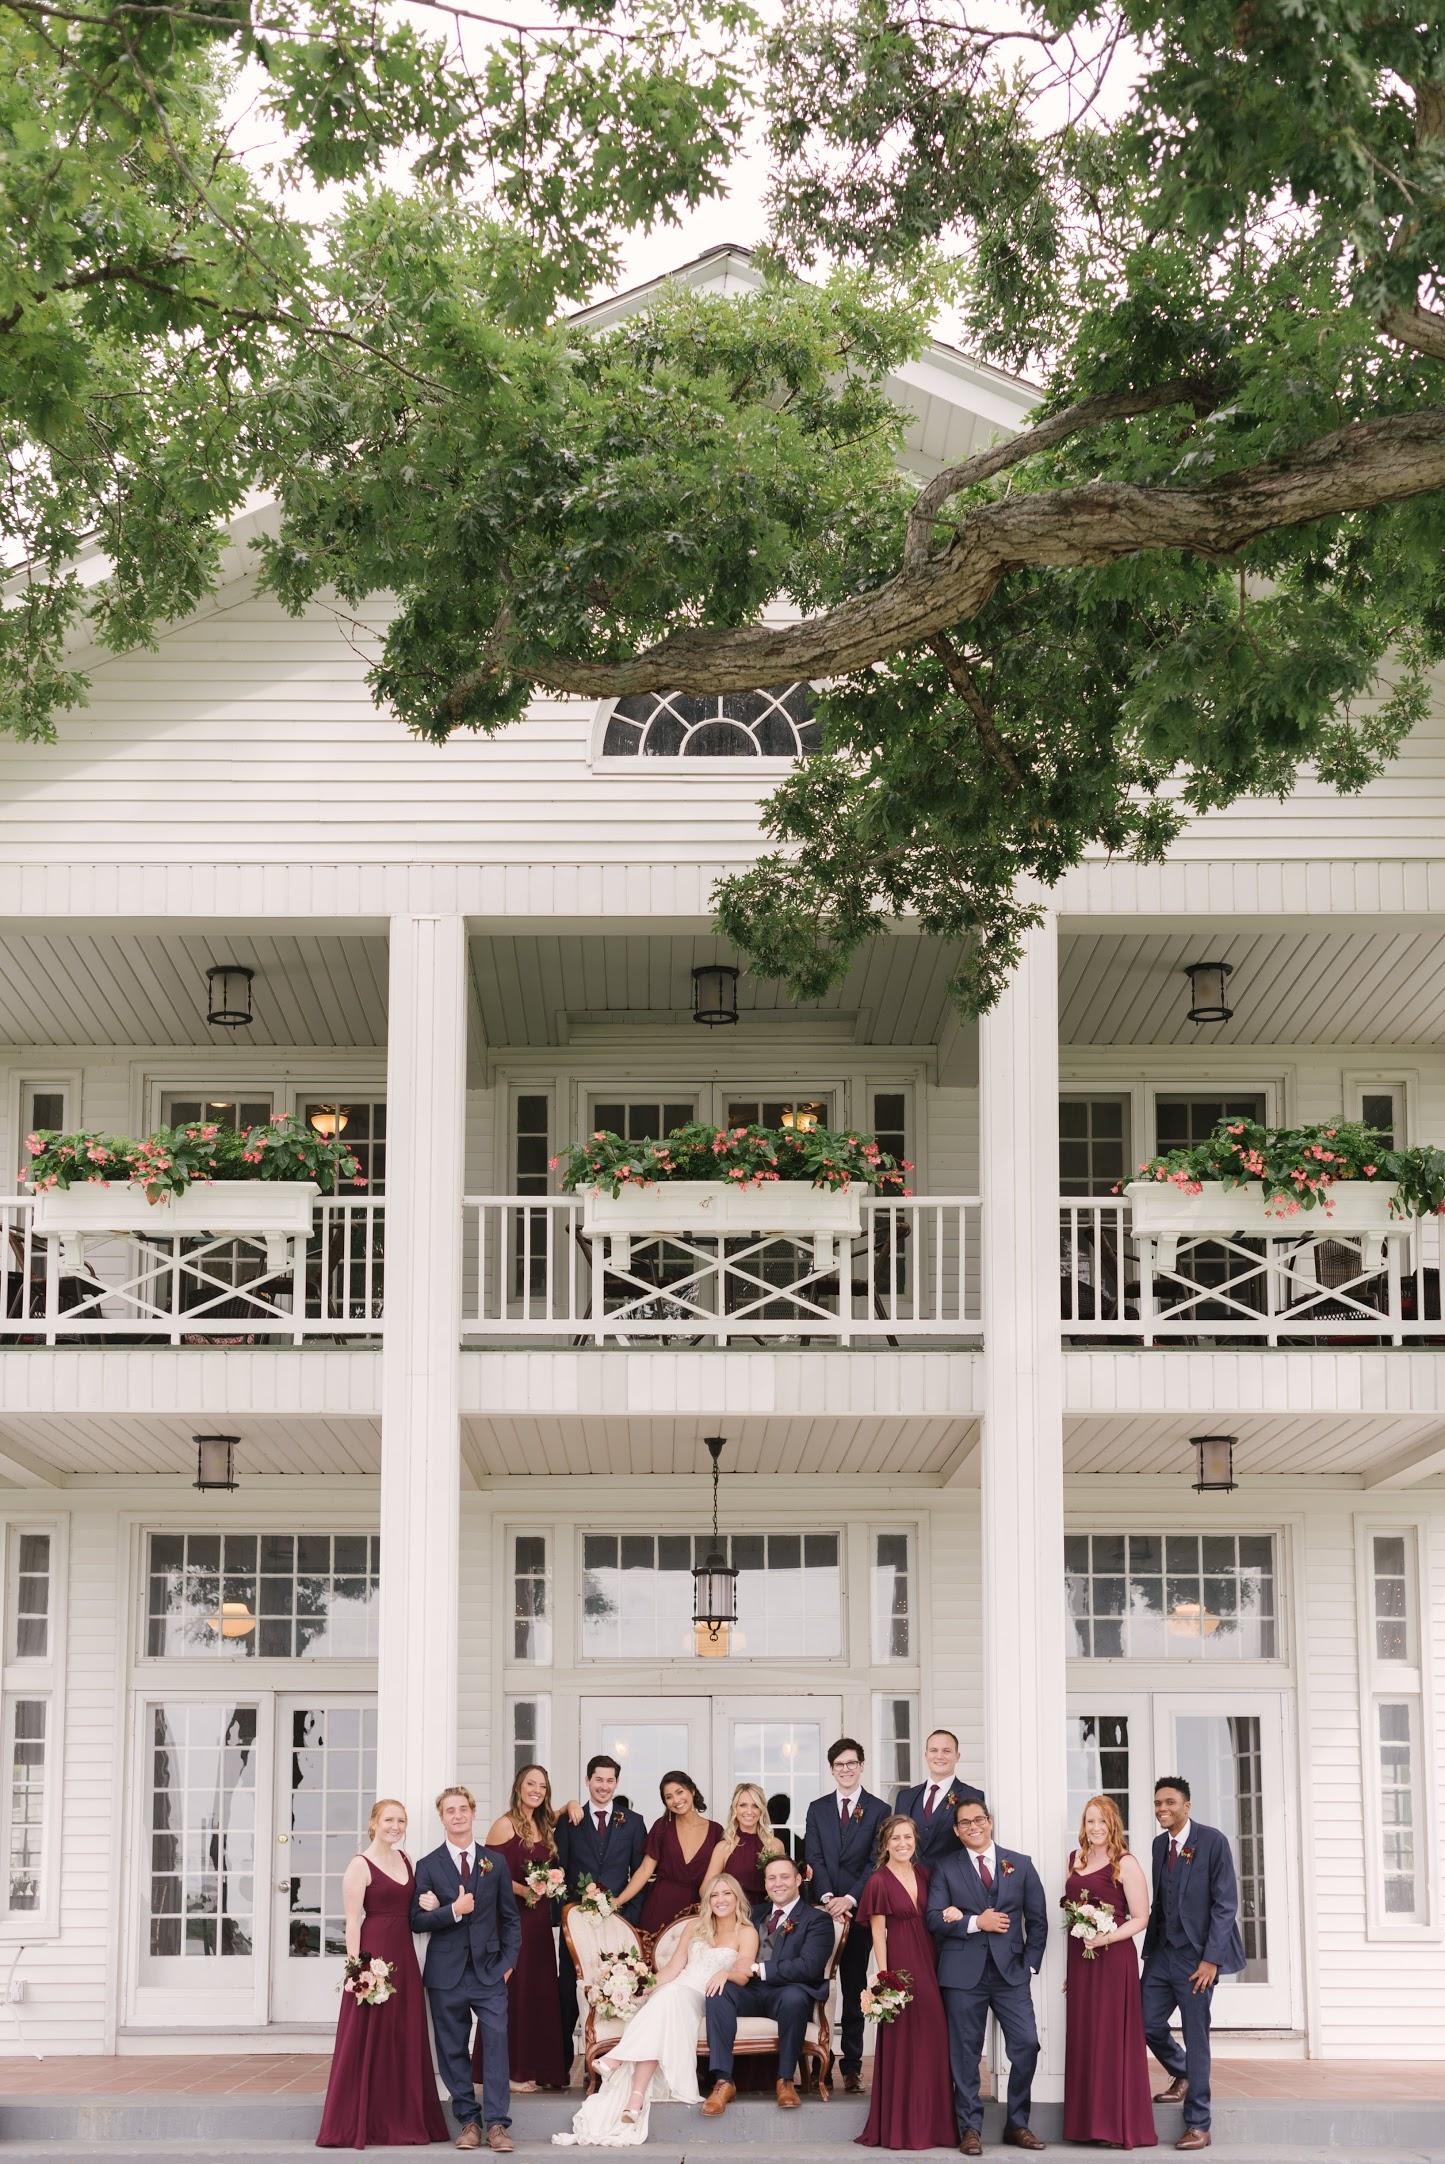 Field-Gems-Photography-Detroit-Michigan-Wedding-Photographer-Family-Photographer-Photobooth-090818-480.jpg